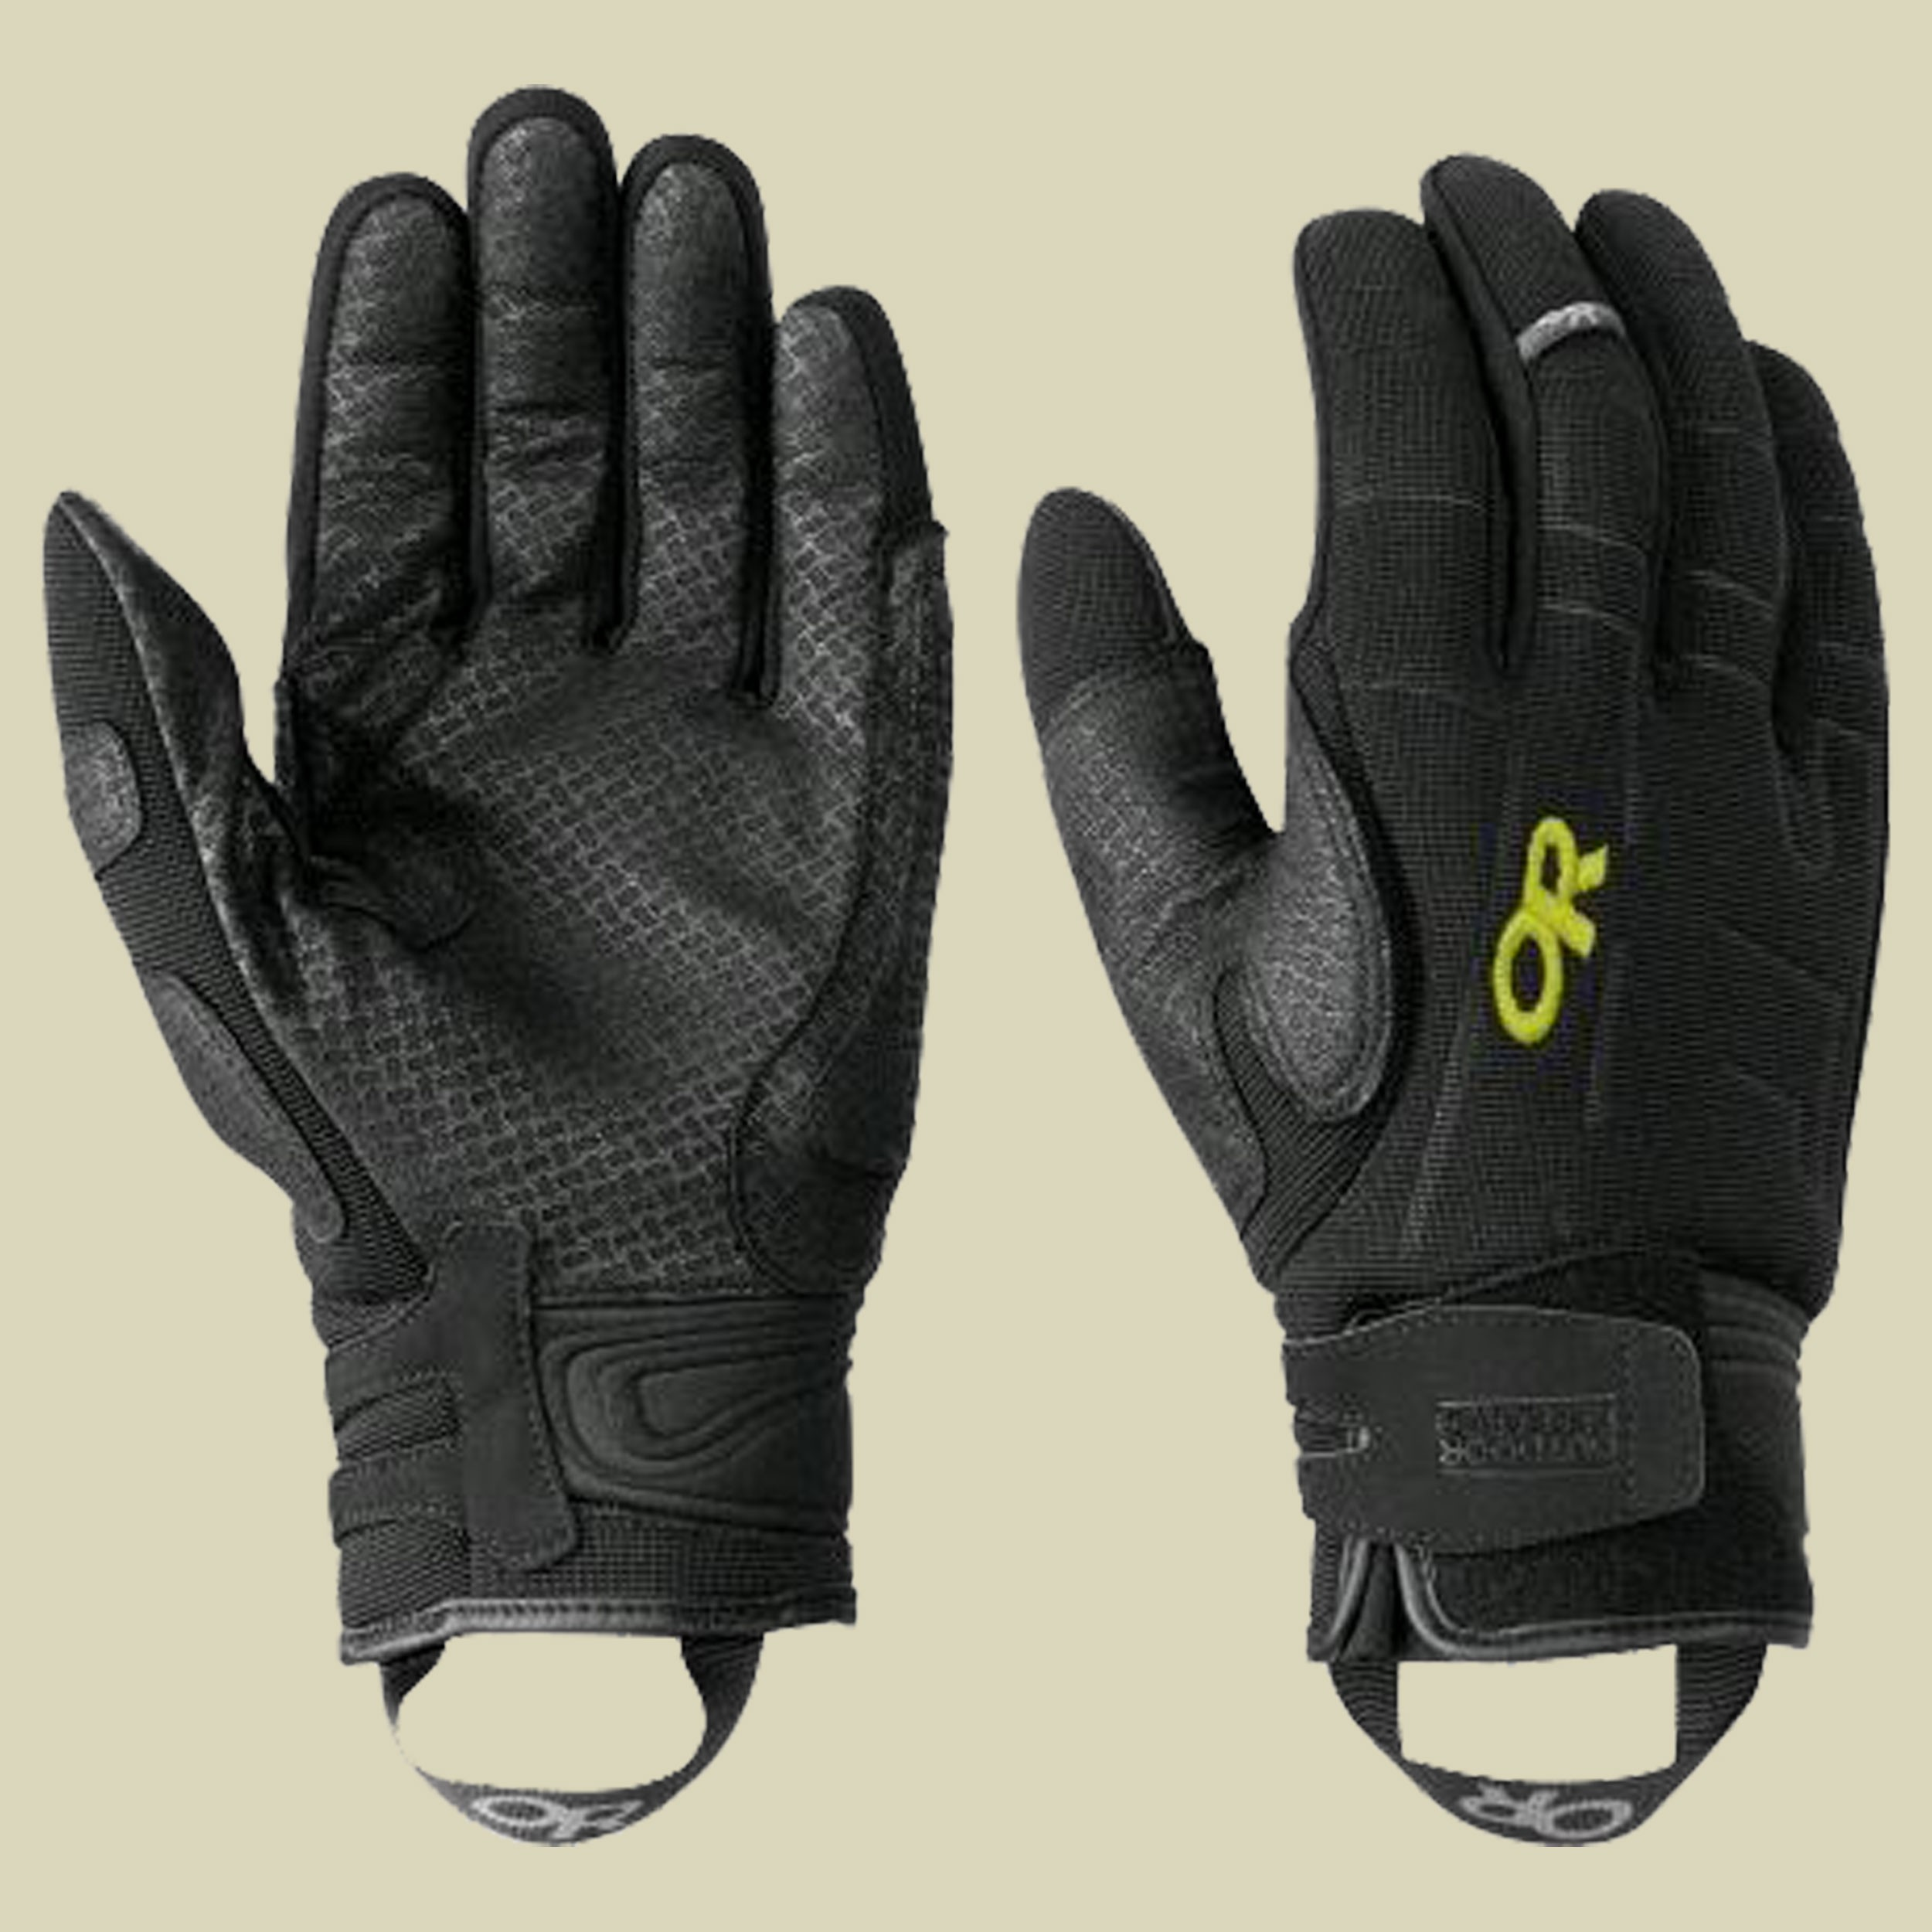 Alibi II Gloves